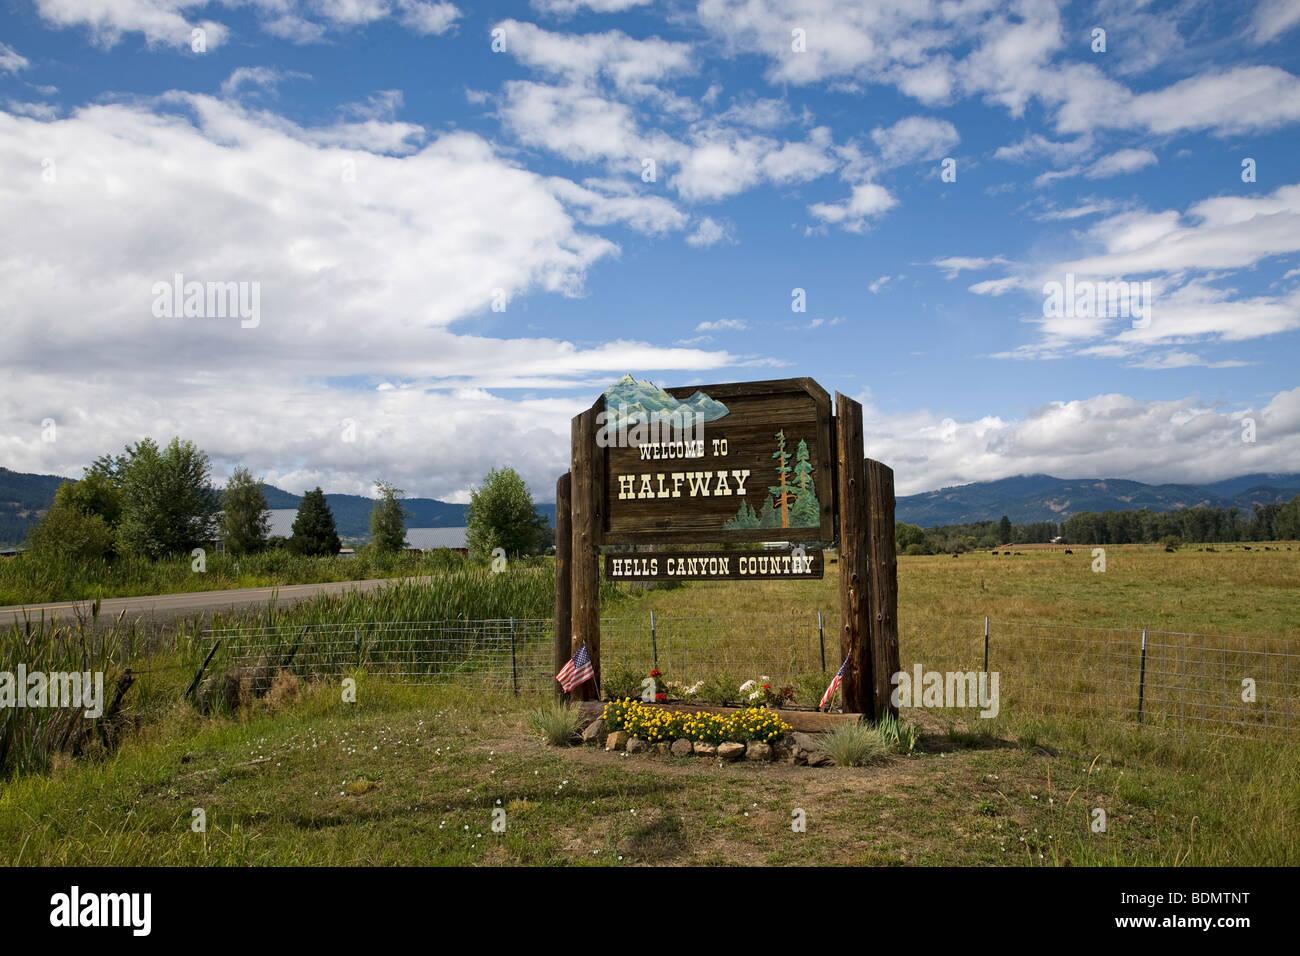 The road to Halfway, Oregon, beneath the Wallowa Mountains. - Stock Image